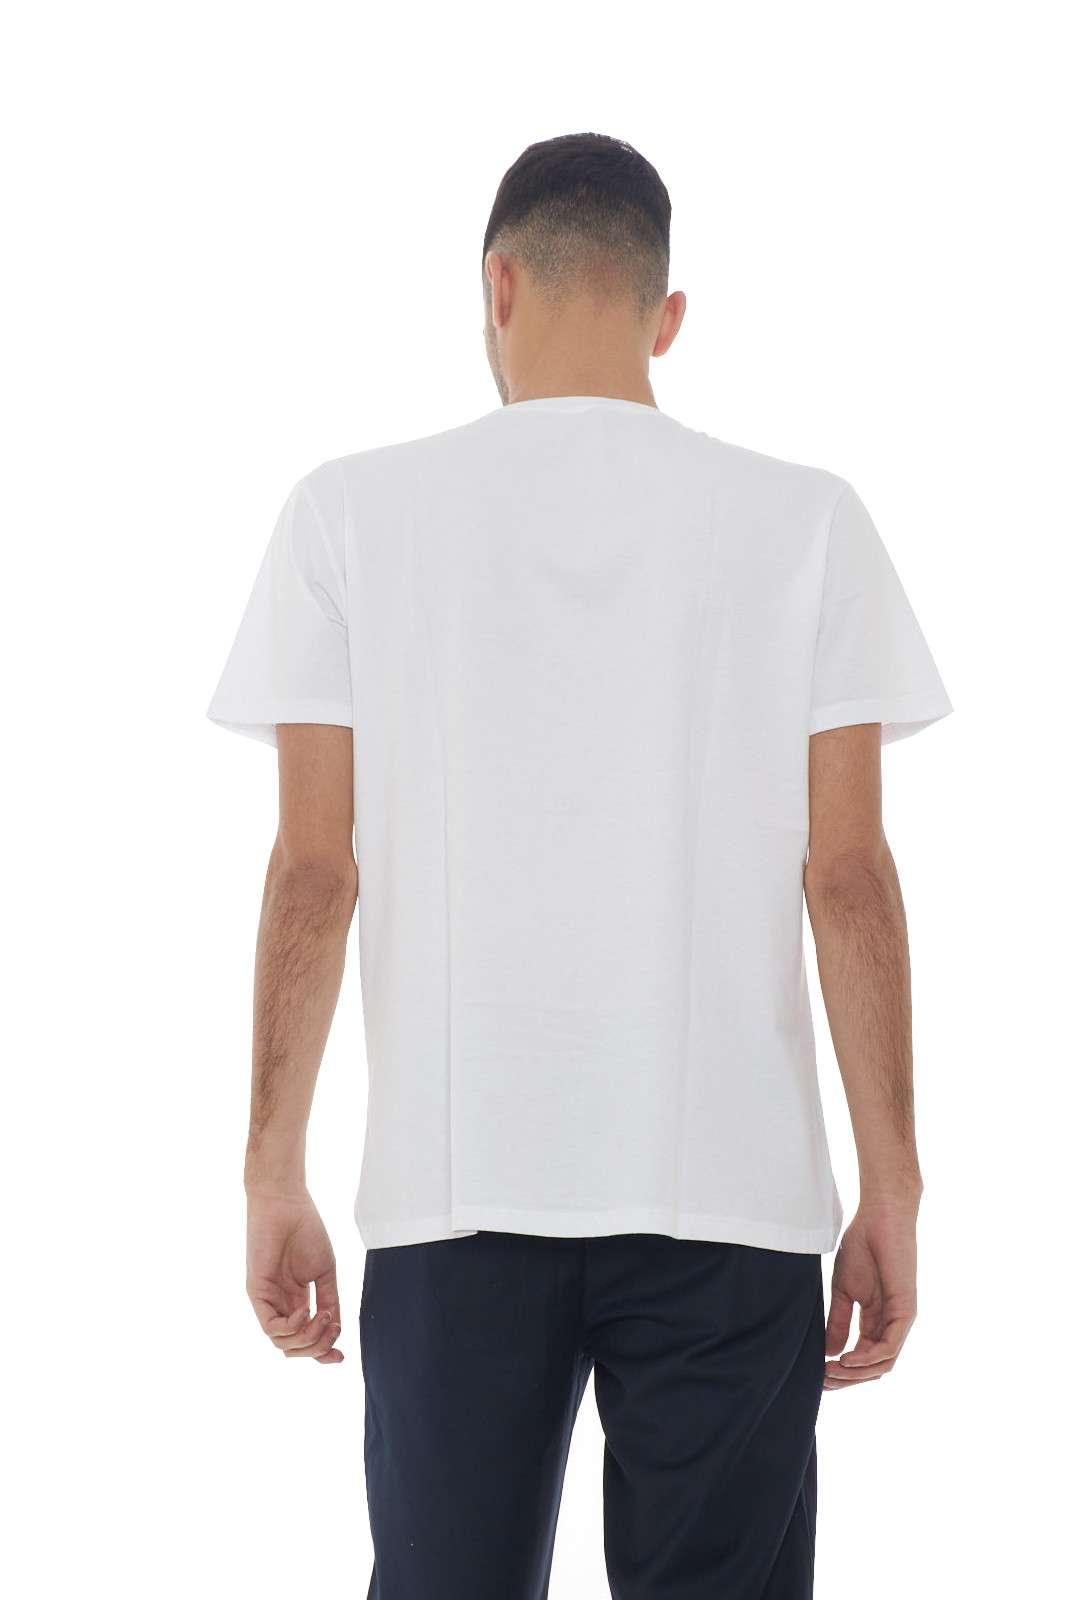 https://www.parmax.com/media/catalog/product/a/i/AI-outlet_parmax-t-shirt-uomo-Imperial-T628VABDAL-C.jpg